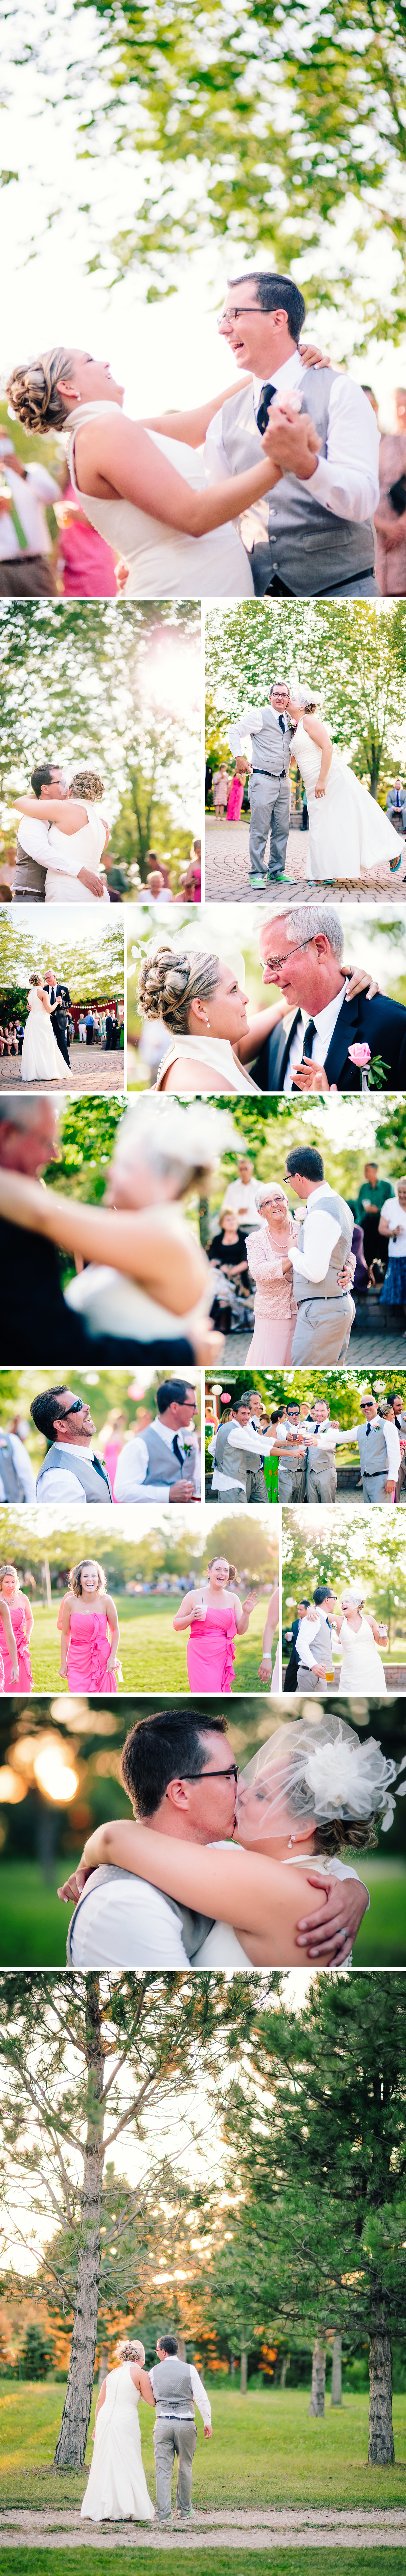 Chicago_Fine_Art_Wedding_Photography_andy-tori4.jpg